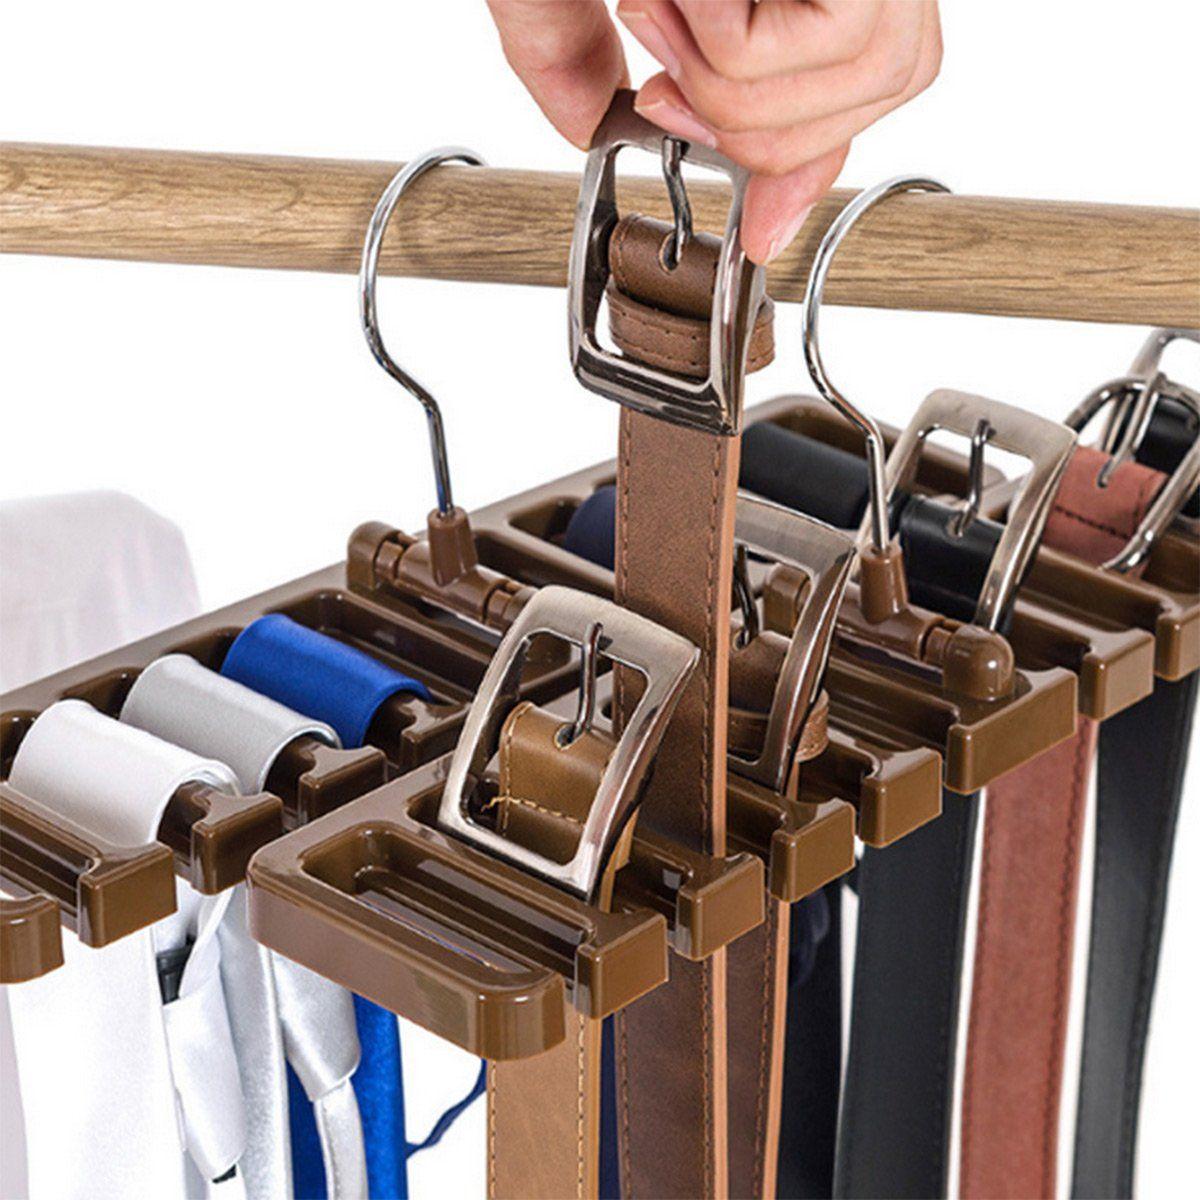 2020 Pack Of 2 Tie Belt Organizer Storage Rack Multifuction